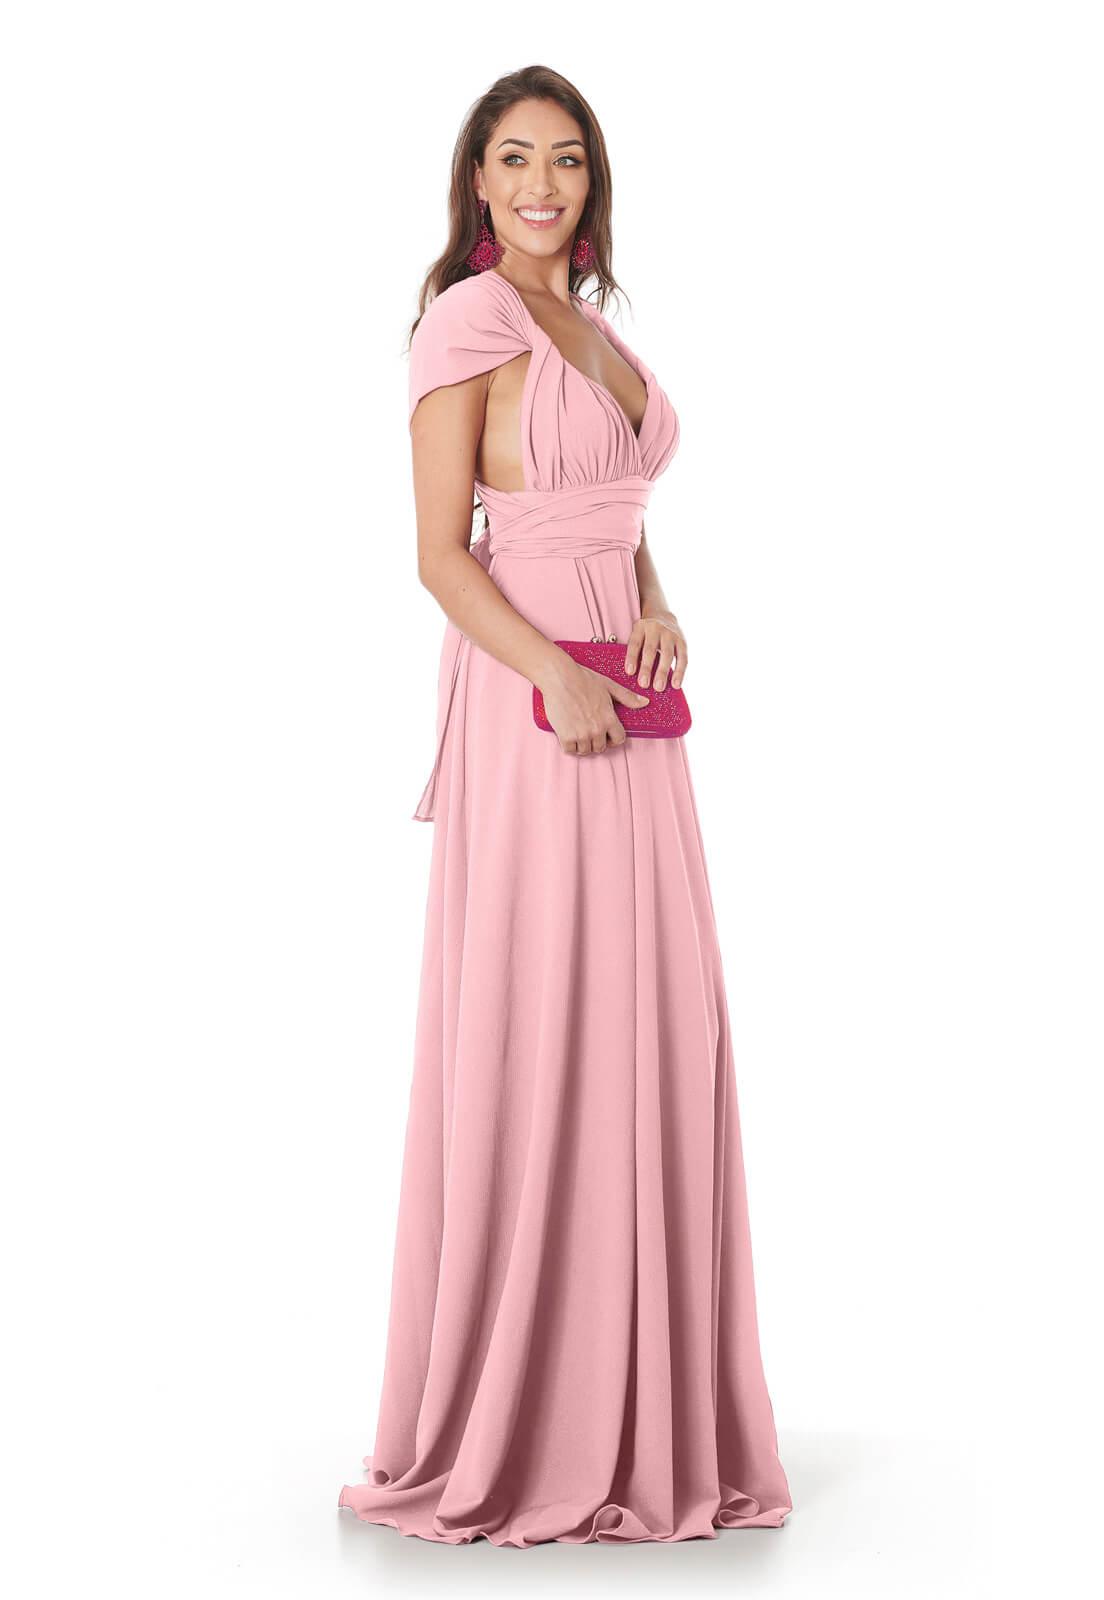 Vestido Longo Mil Formas Rosa Claro Lala Dubi